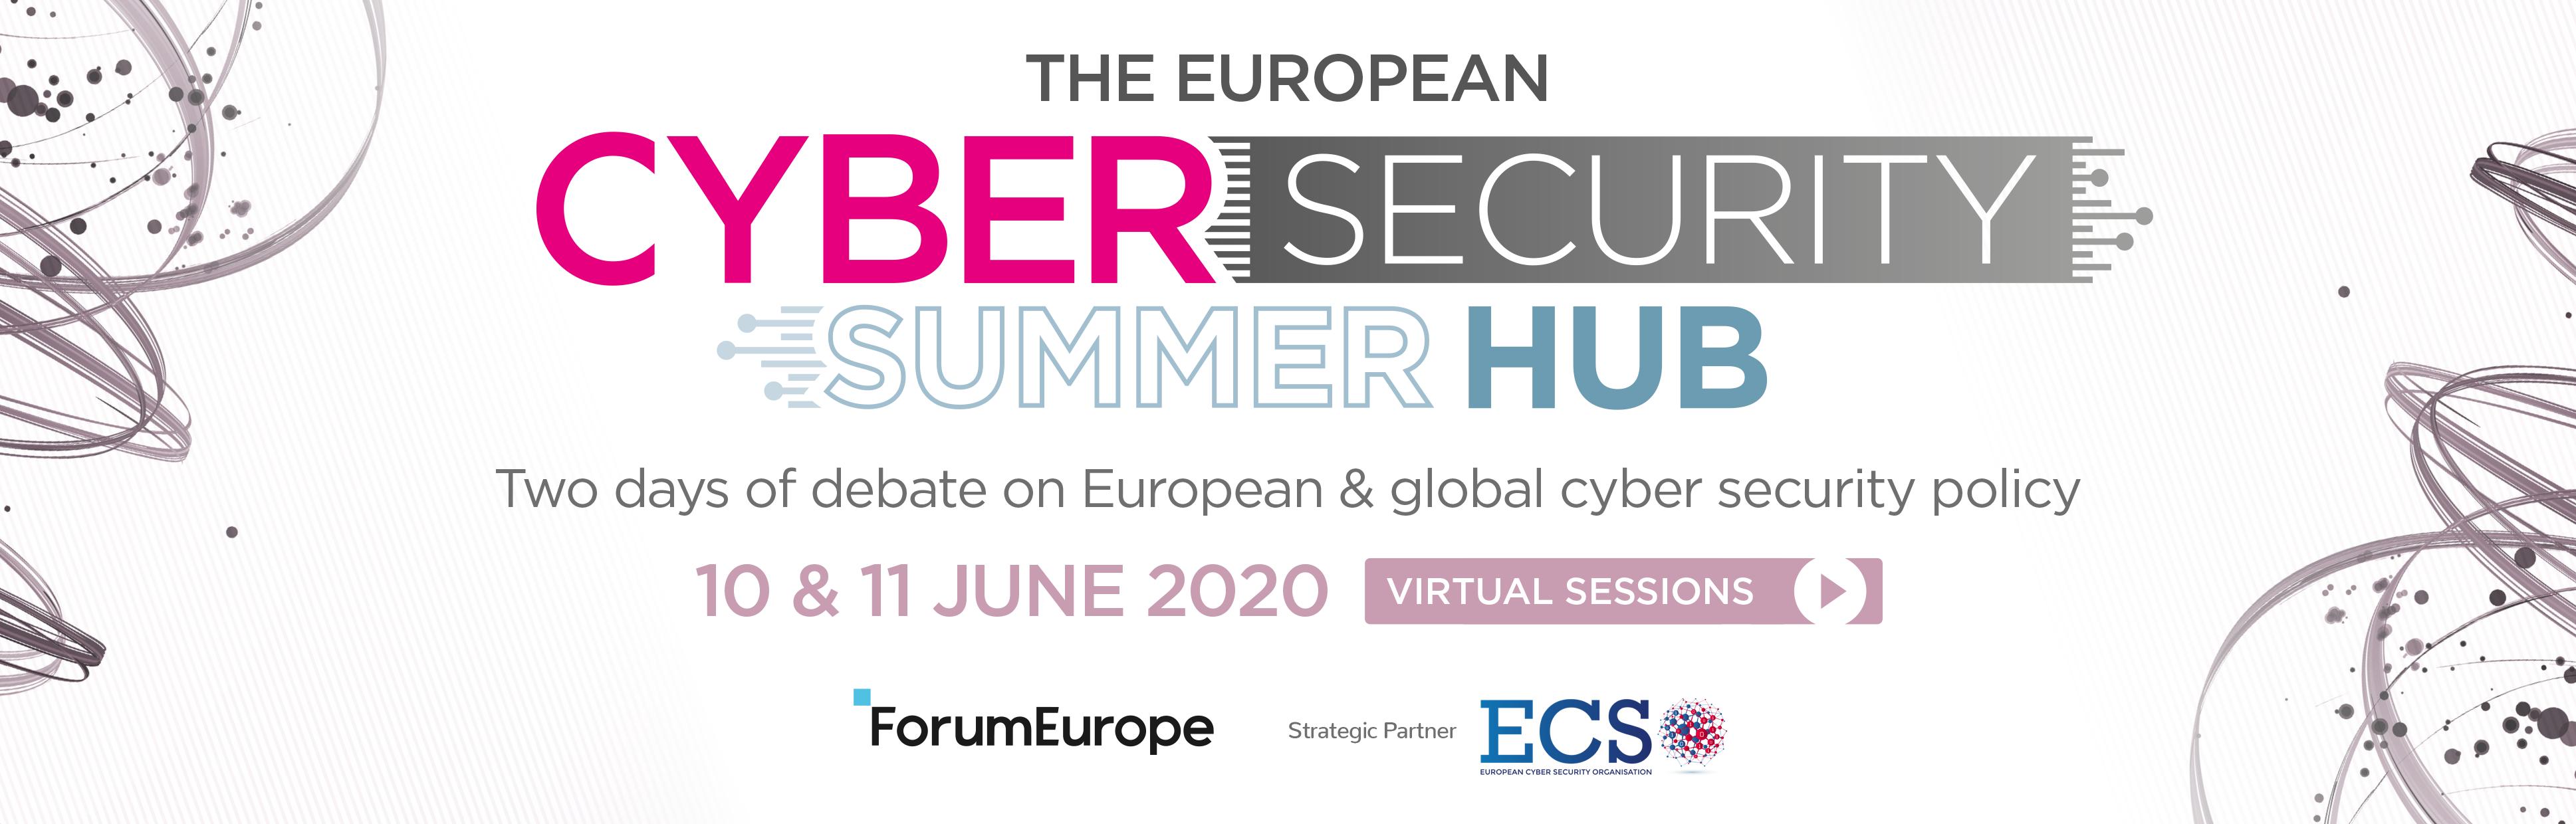 Cyber Security Summer Hub